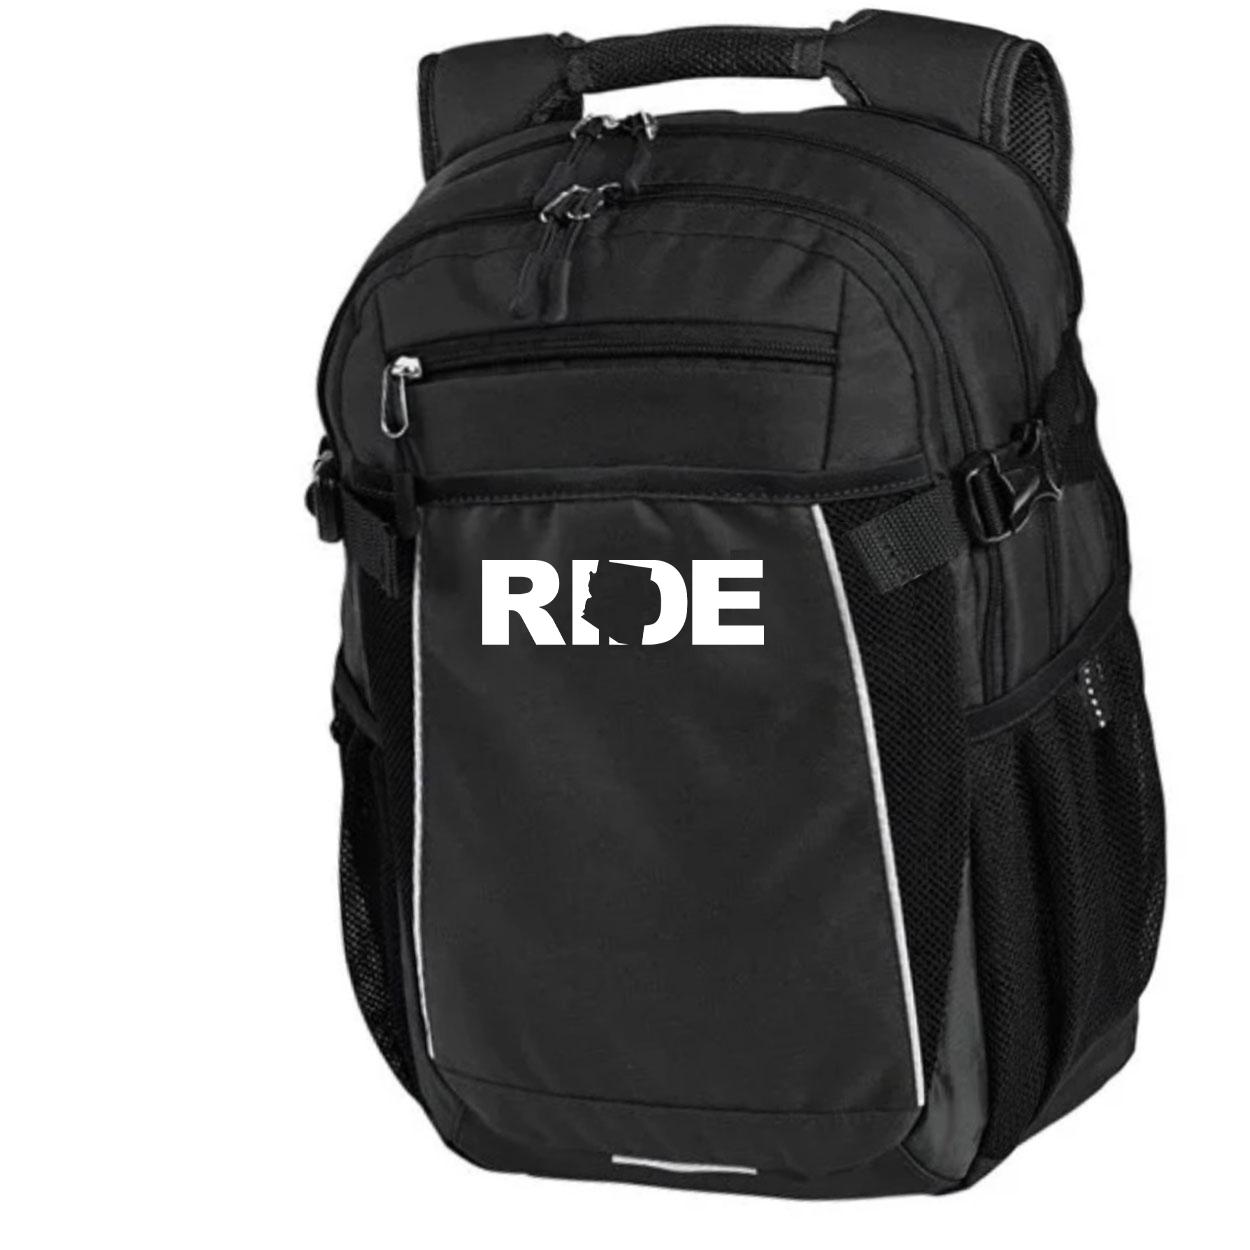 Ride Arizona Classic Pro Pioneer Backpack Black (White Logo)